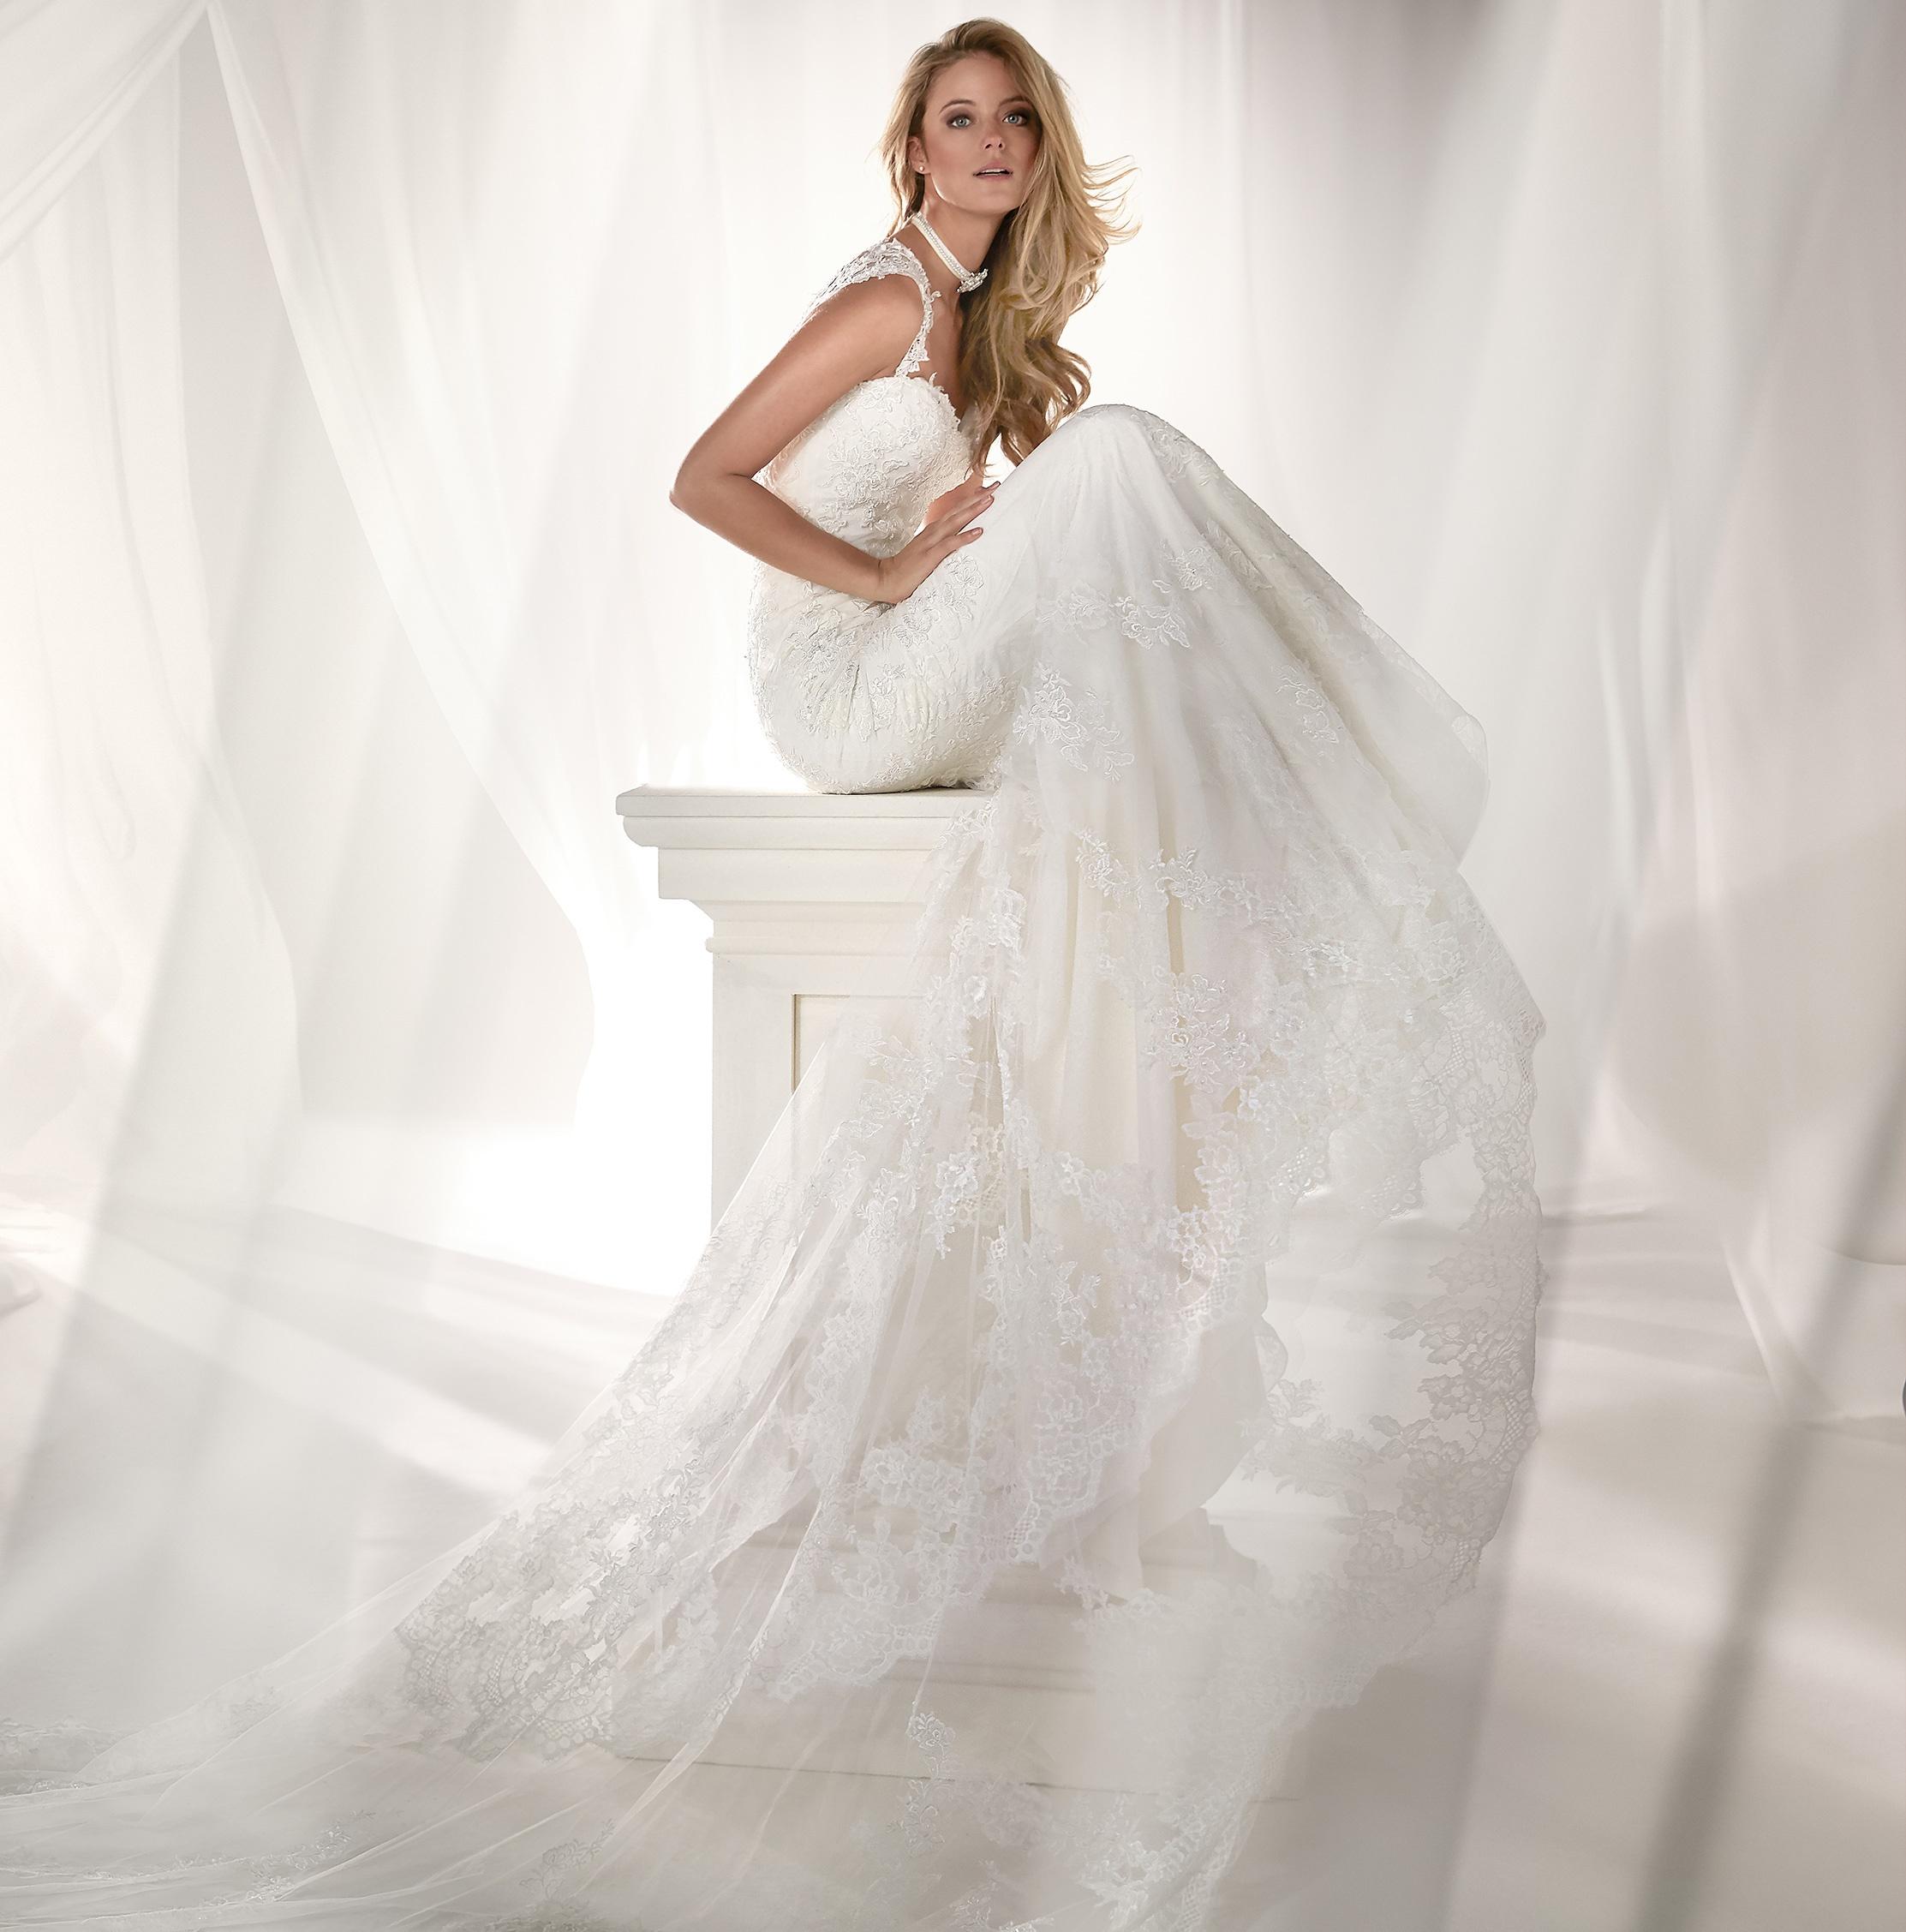 nicole-spose-NIAB19114-Nicole-moda-sposa-2019-921.jpg